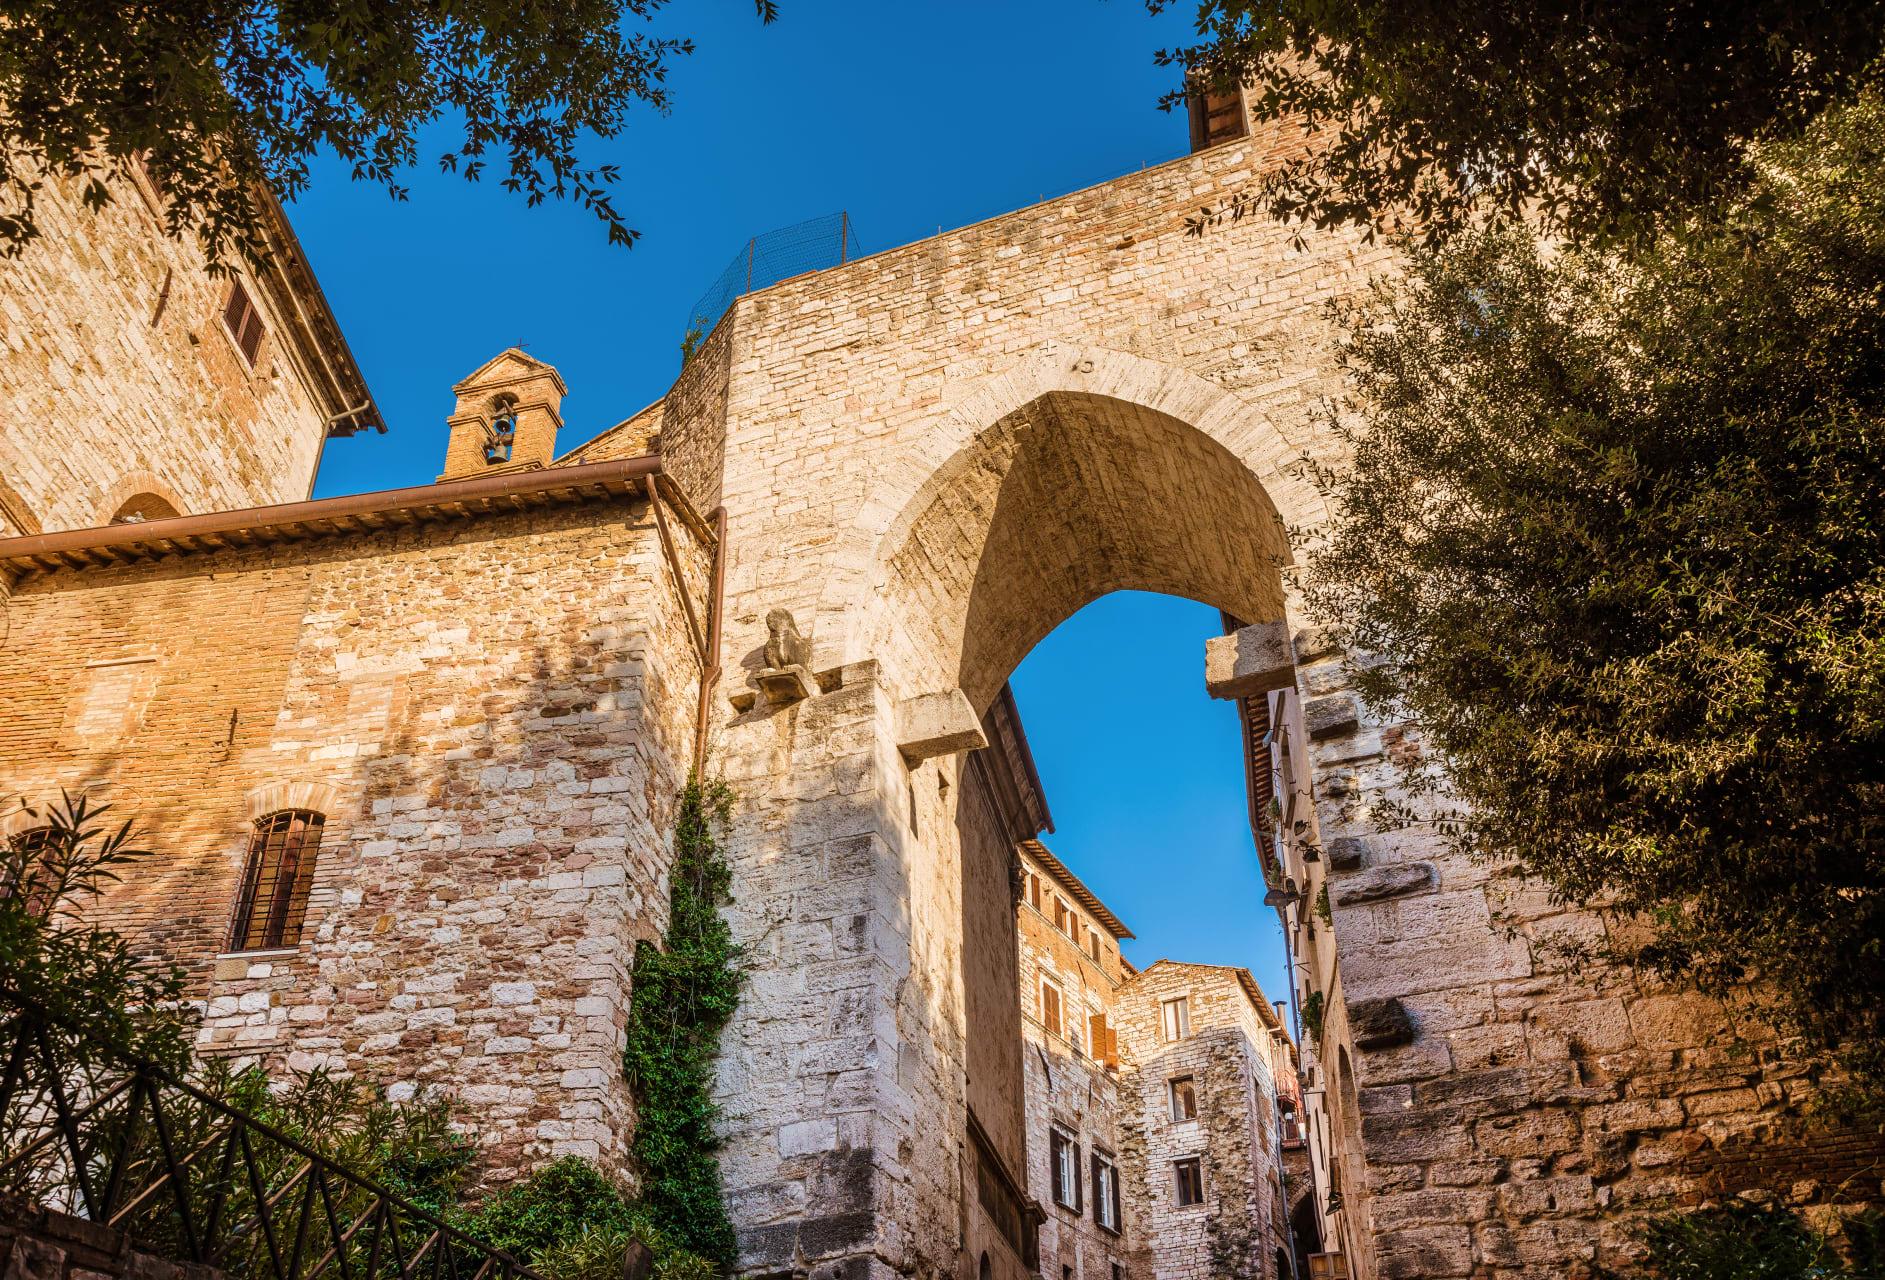 Perugia - Perugia 5 Colours - Blue : Porta Santa Susanna